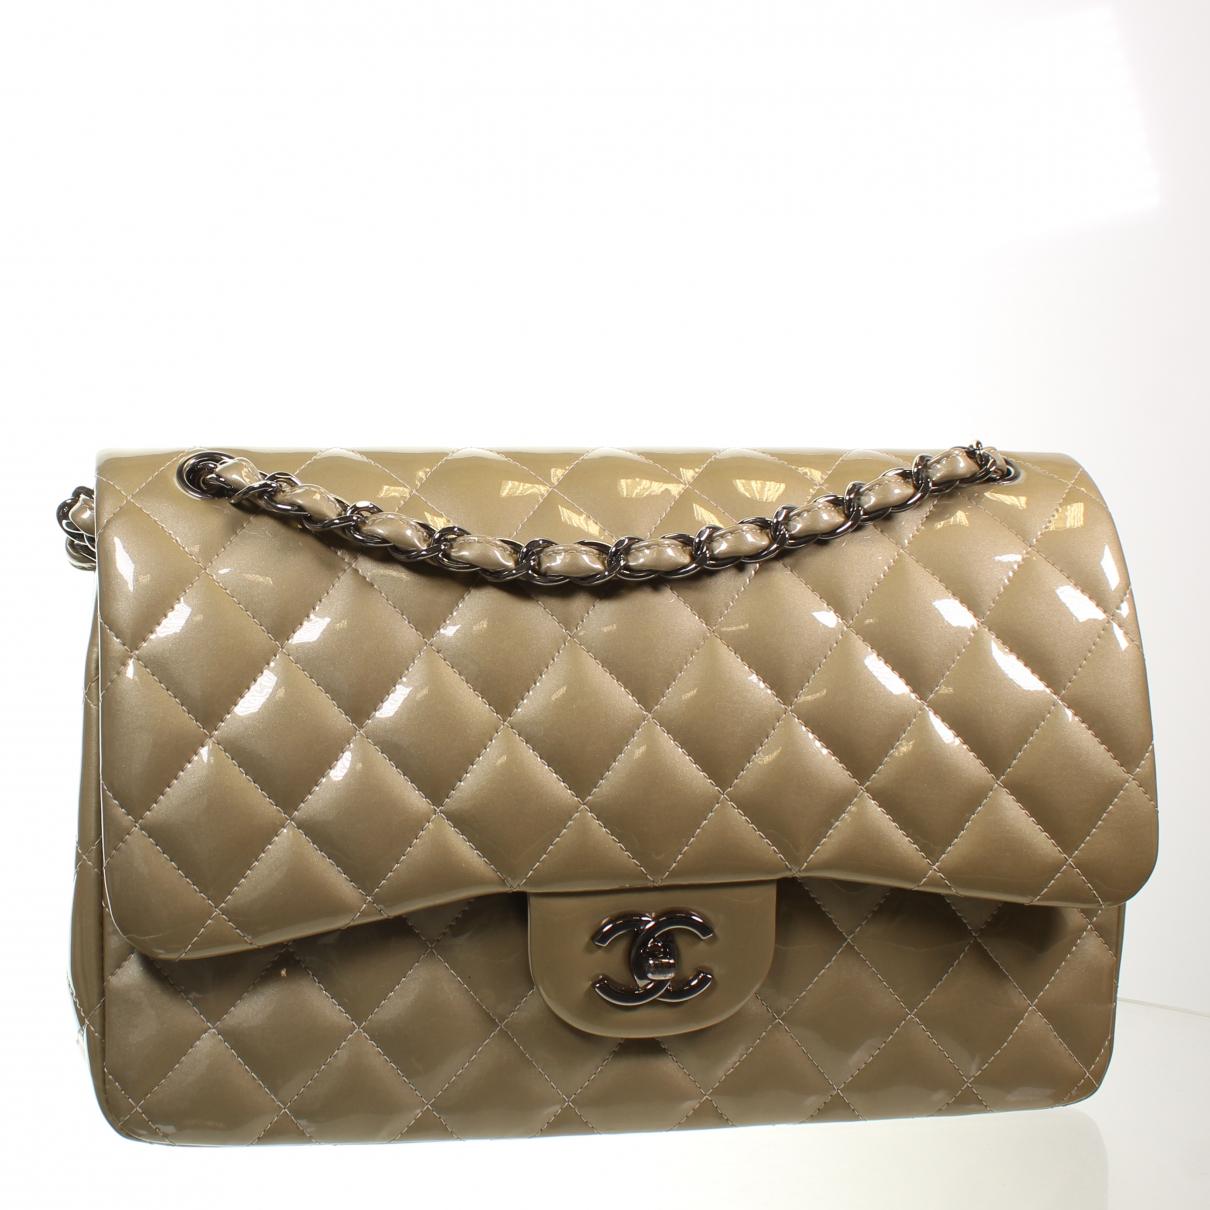 Chanel N Grey Patent leather handbag for Women N